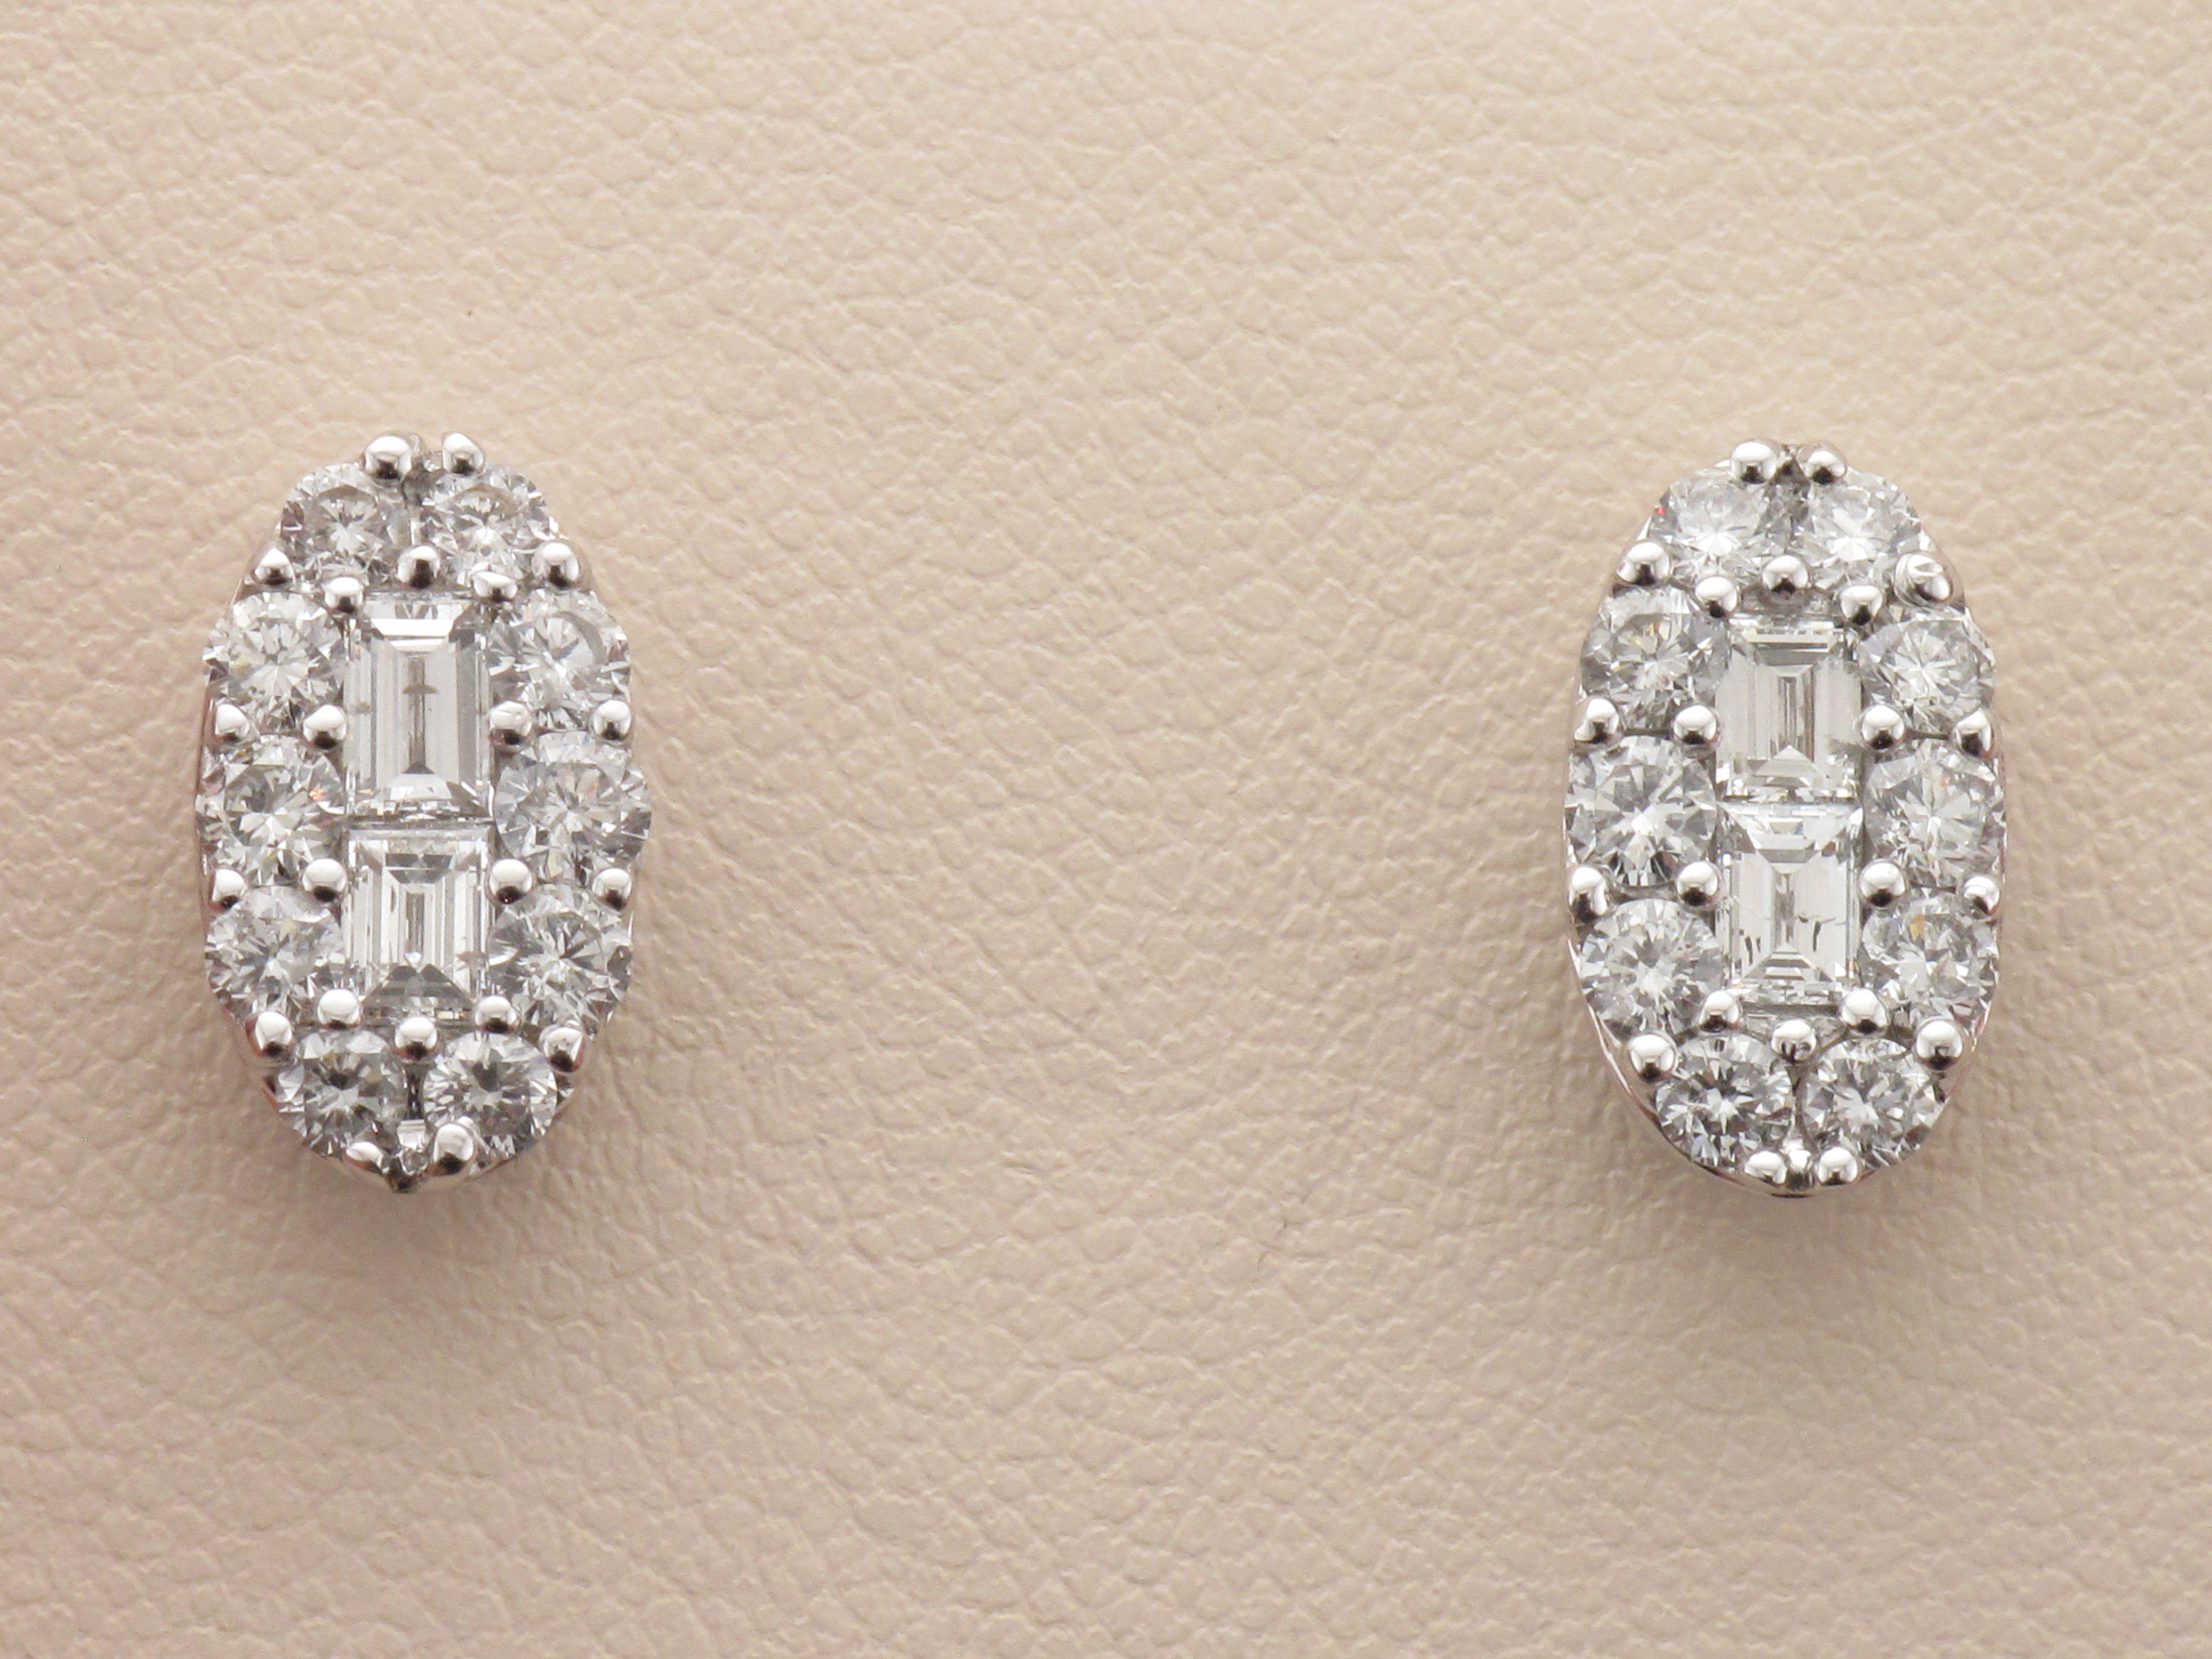 Beautiful Cluster Diamond Earrings